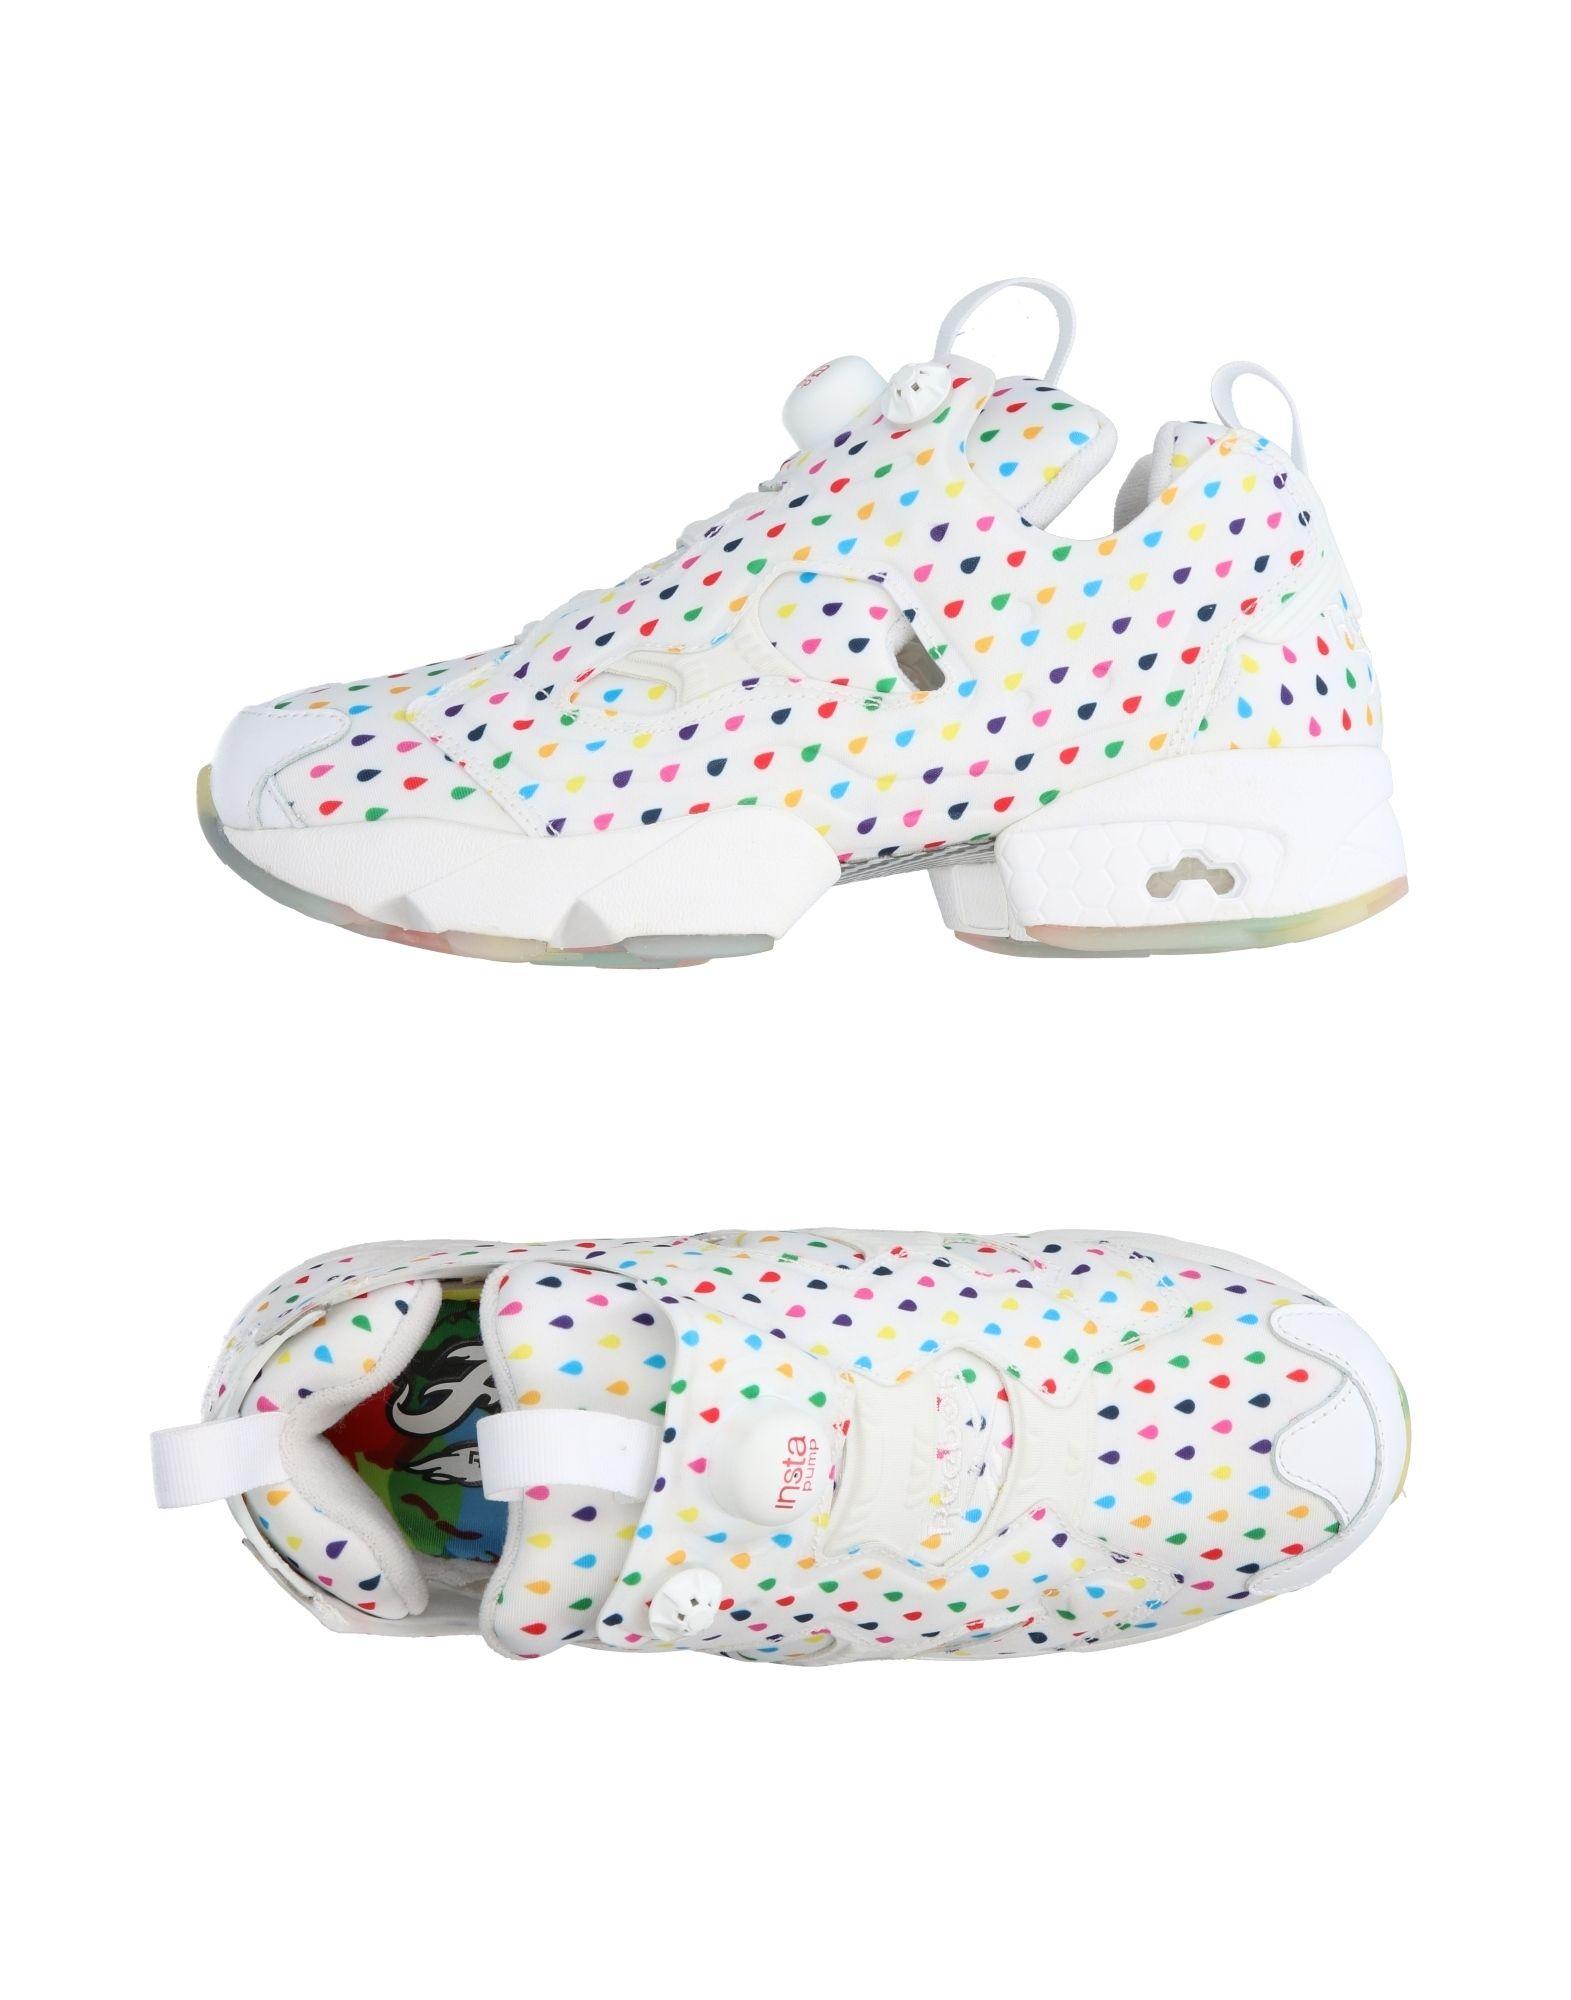 Herren Reebok Sneakers Herren   11297915RV Heiße Schuhe 1952a3